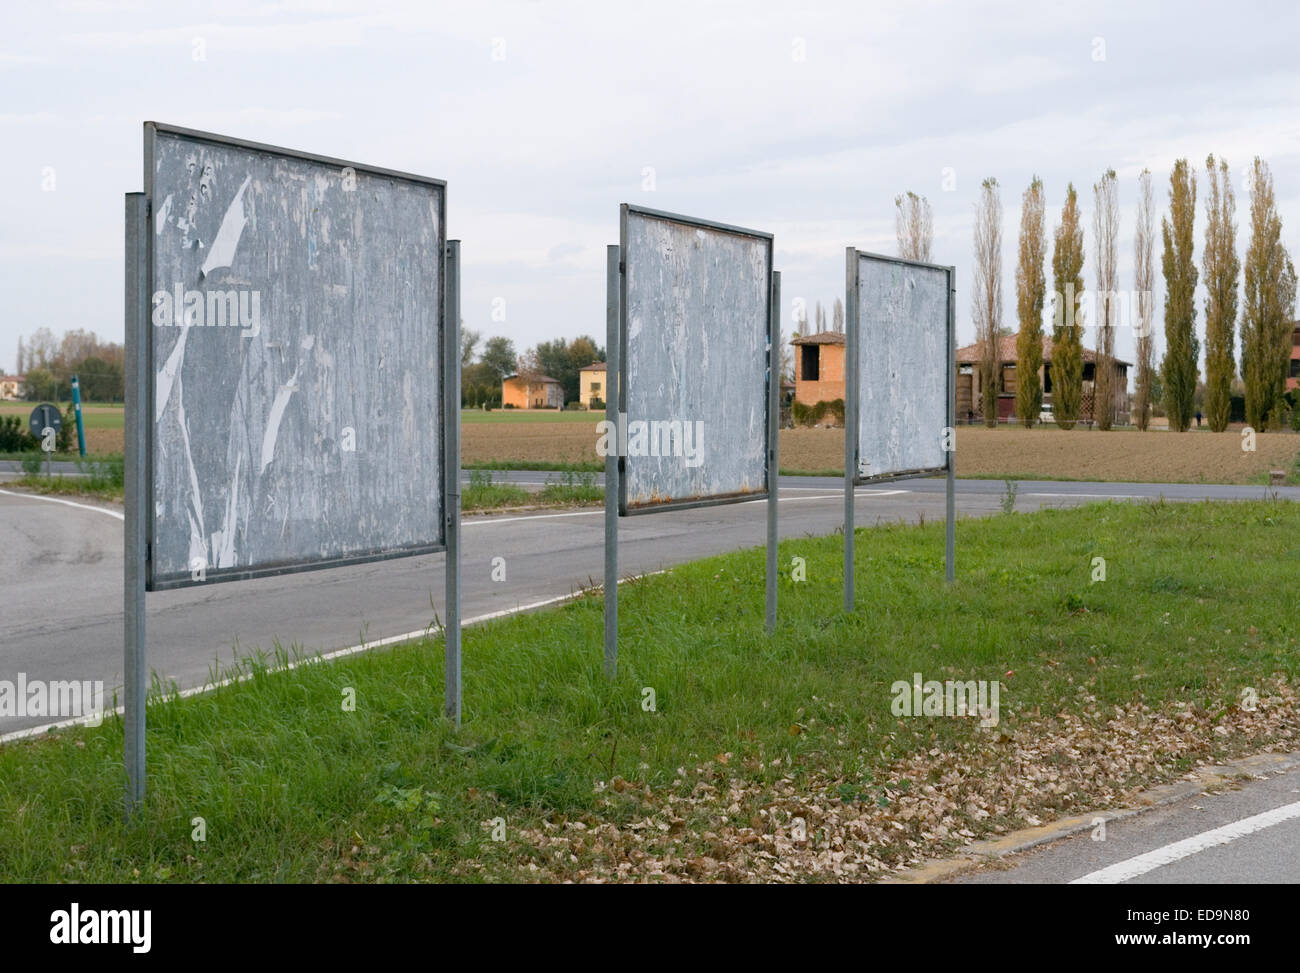 Billboards on roadside, Emilia Romagna, Italy - Stock Image